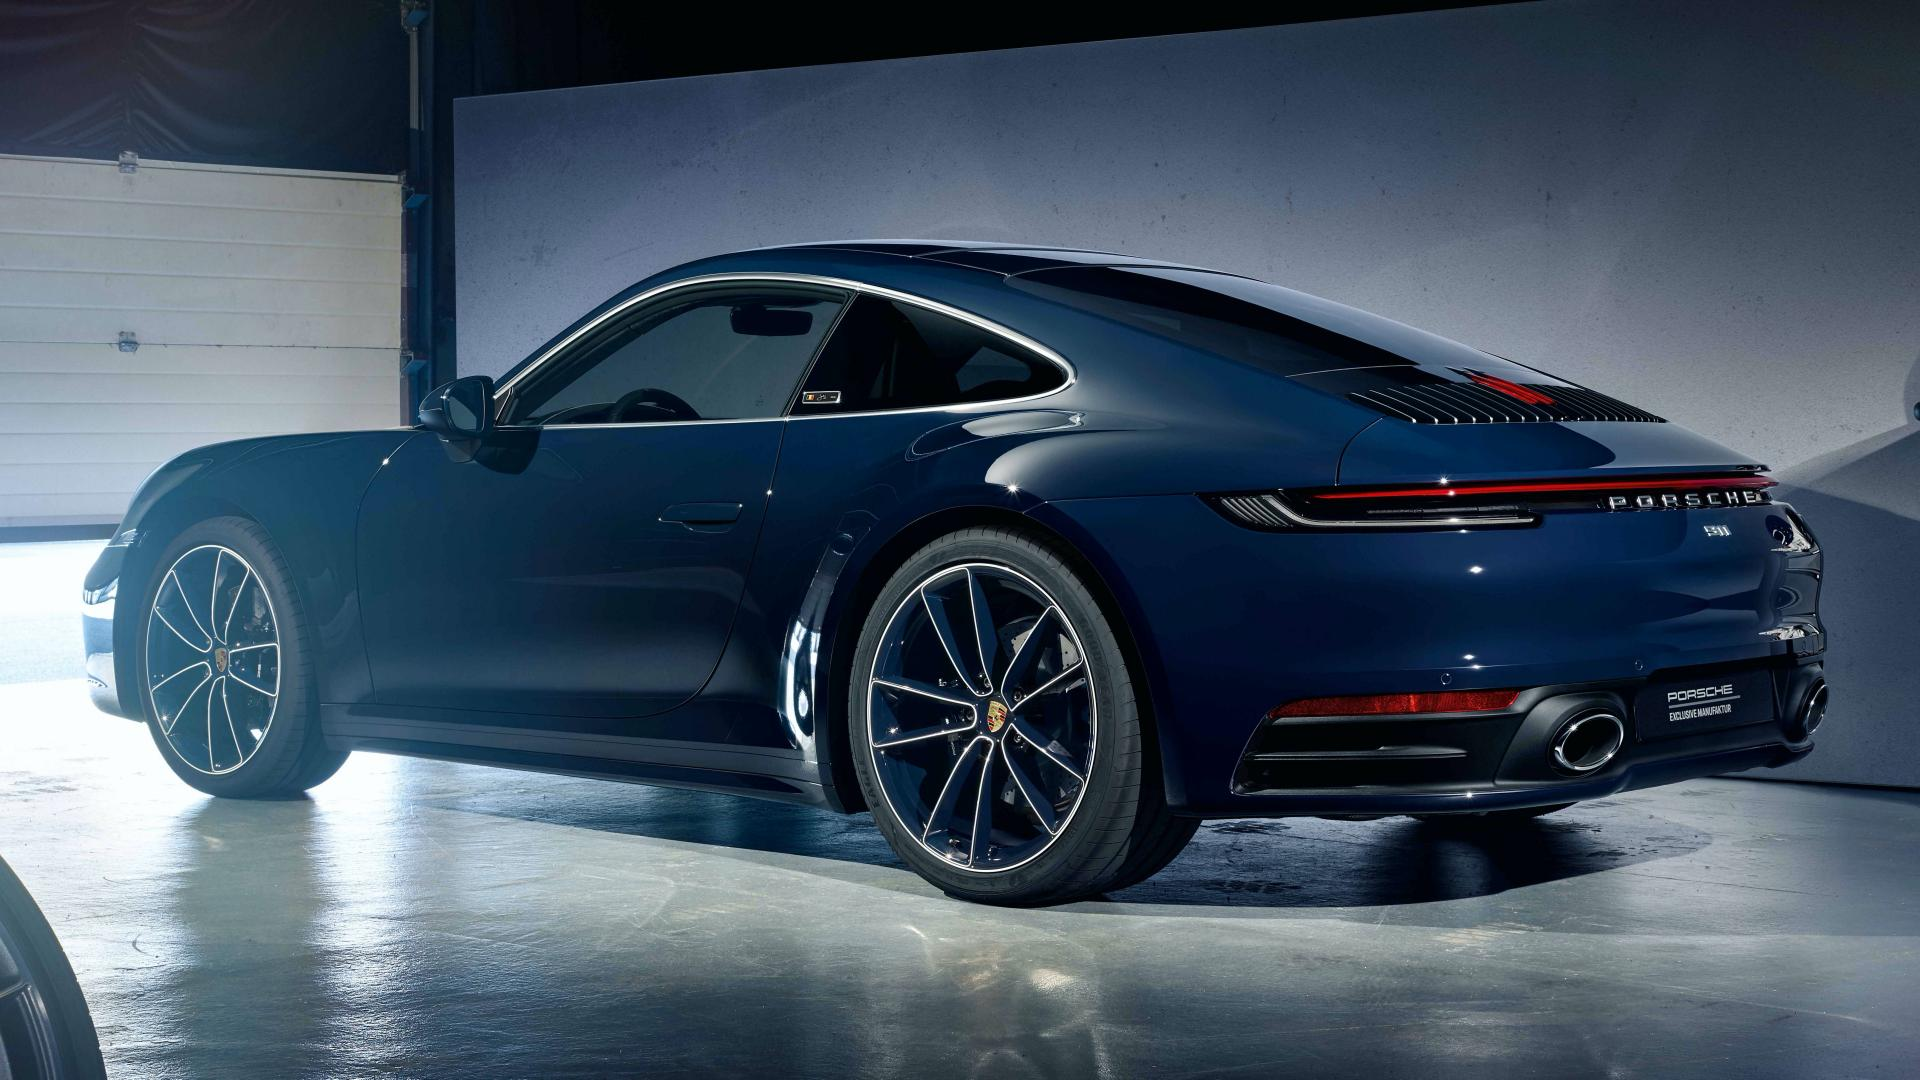 Porsche-911-Belgian-Legend-Edition-2020-Jacky-Ickx-12